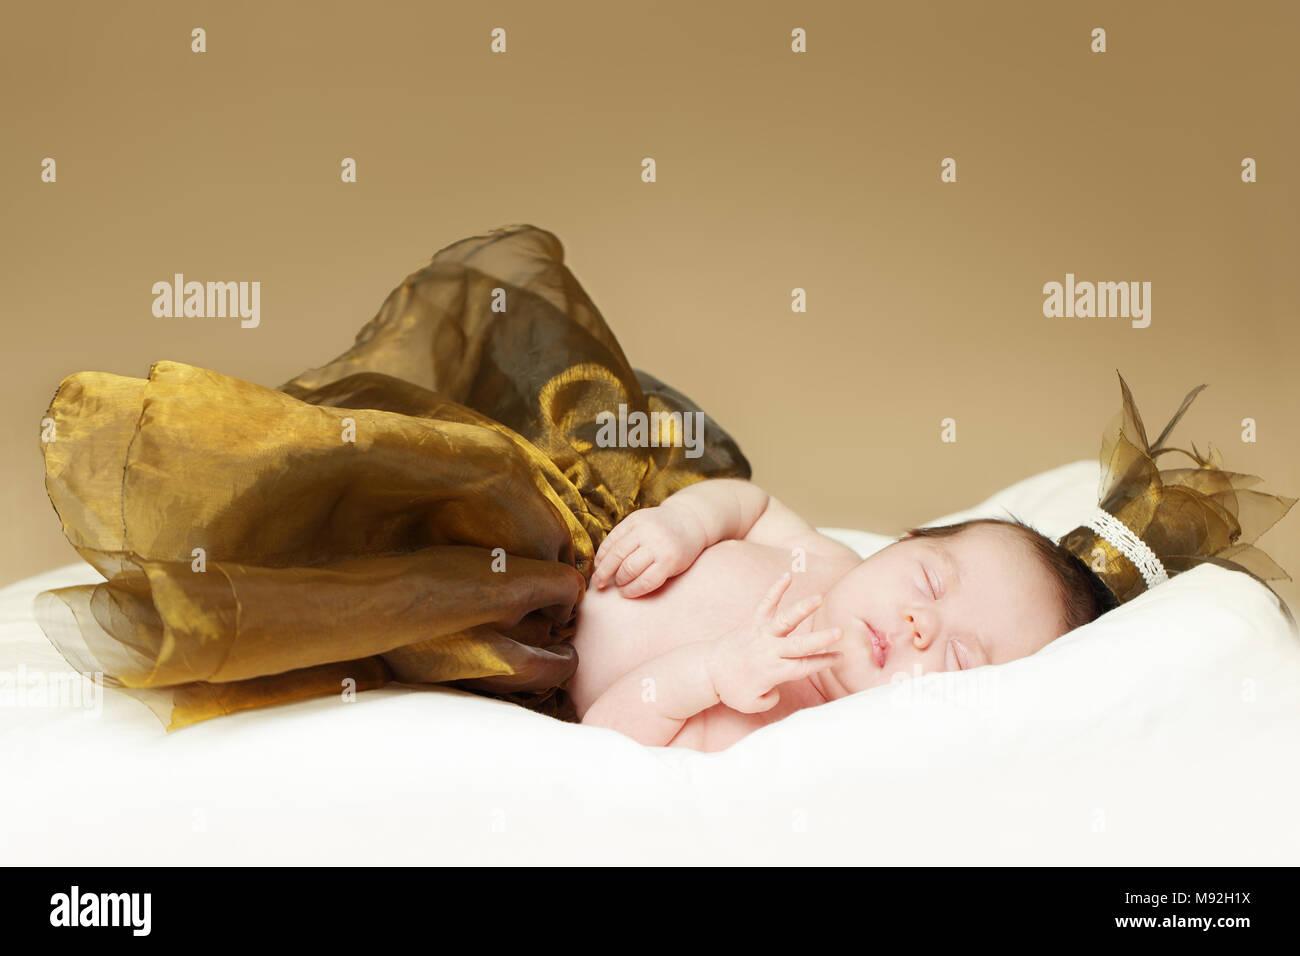 Baby, sleeping newborn - fine-art portrait, baby up to one month - Stock Image